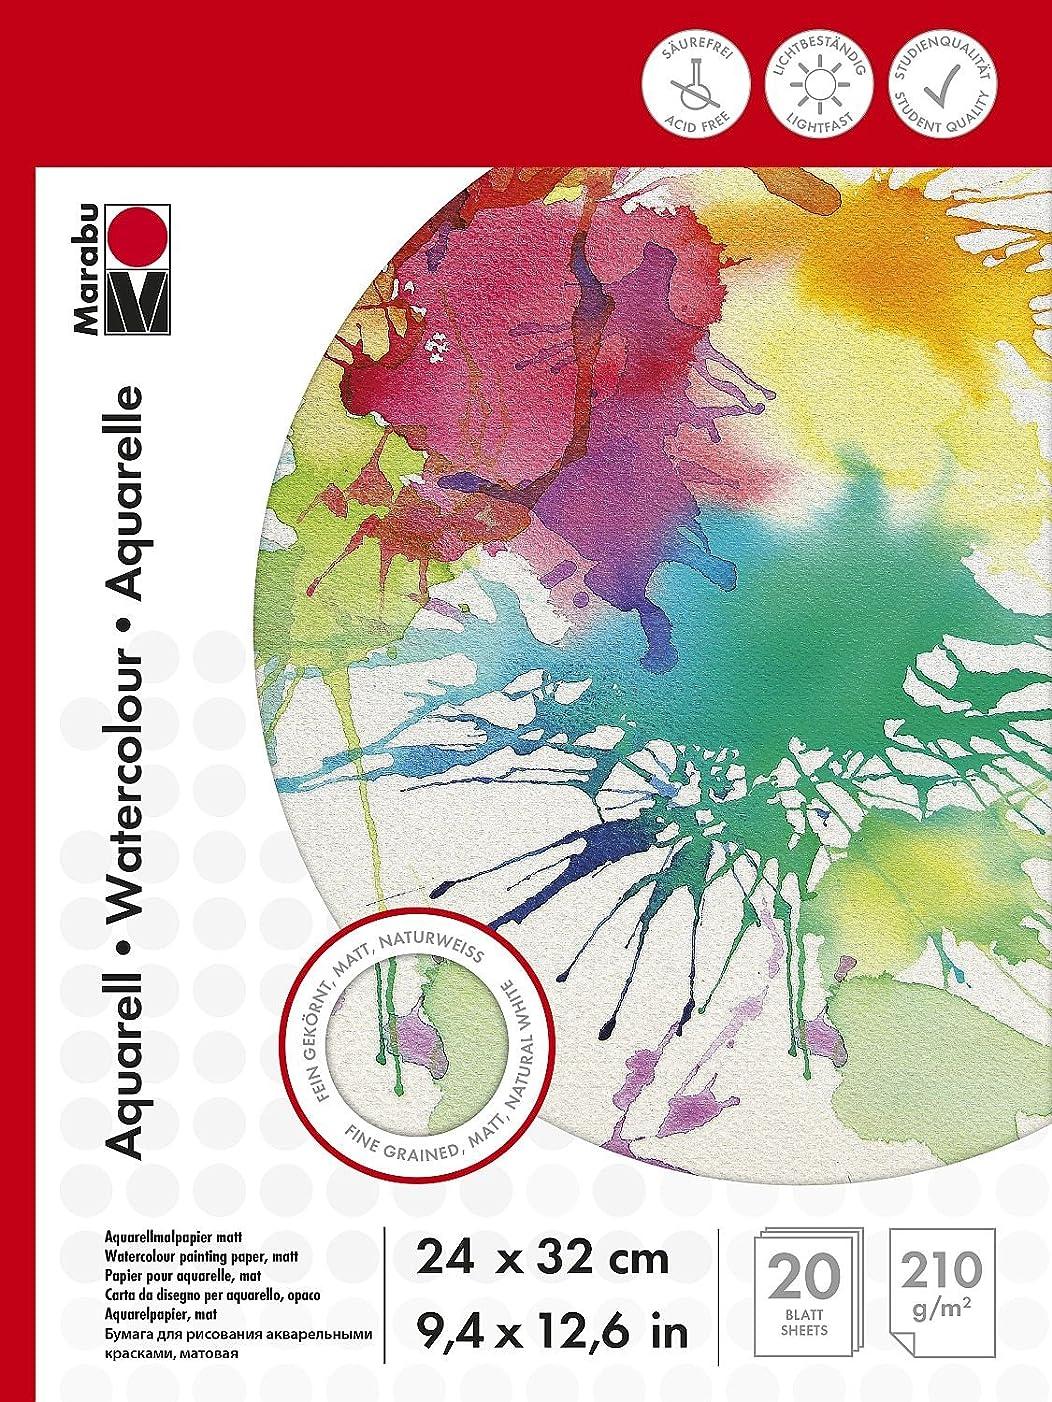 Marabu 161200024?Watercolour Pad, 24?x 32?cm, 210?g